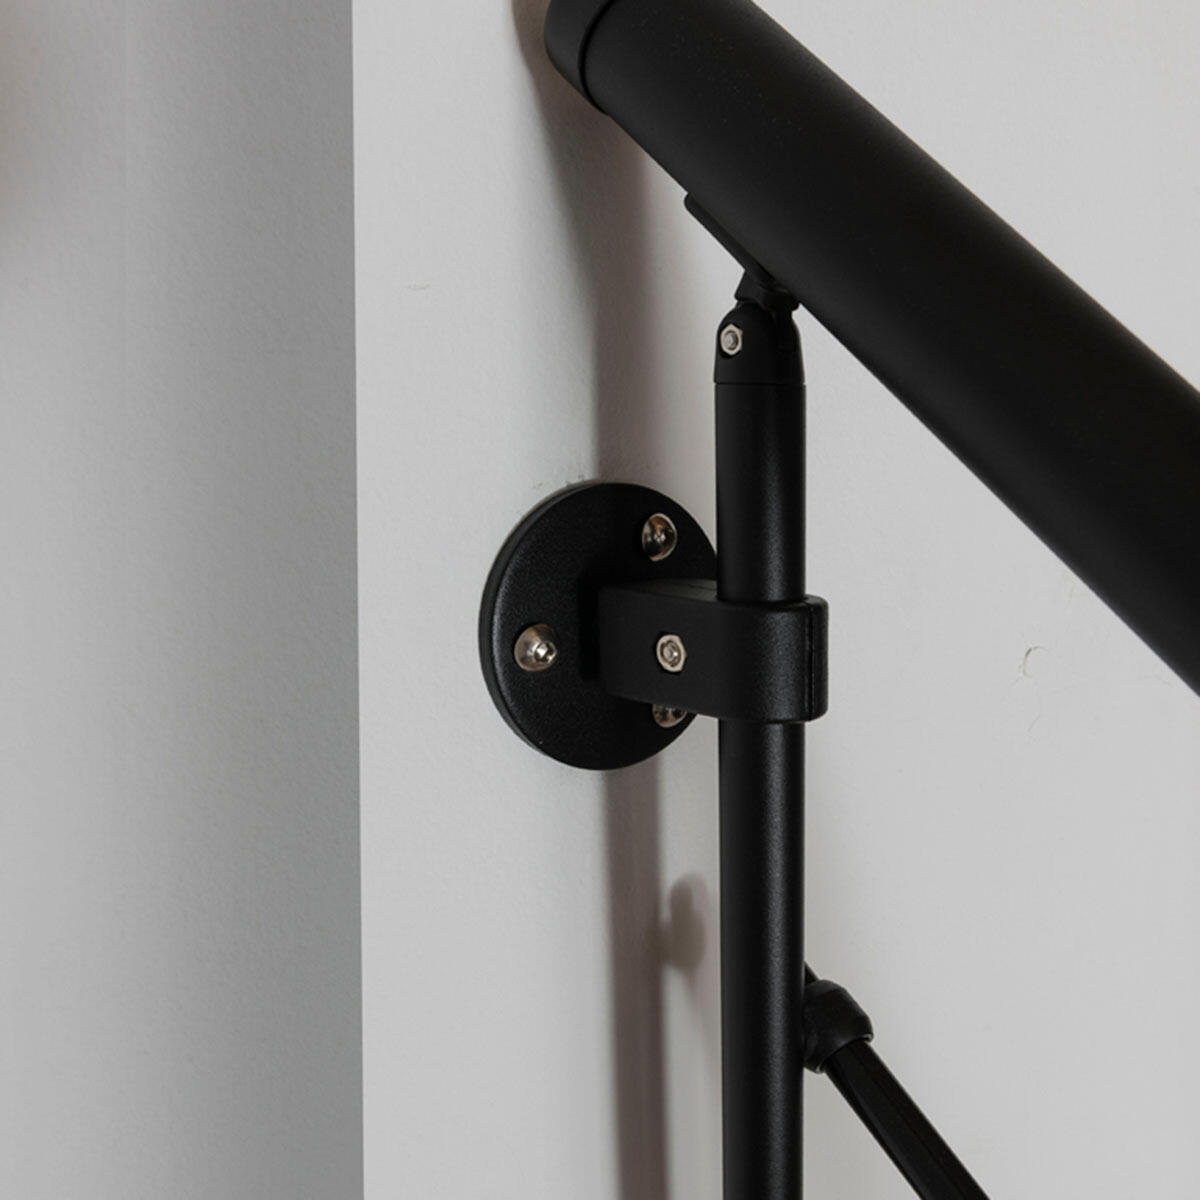 Scala a rampa 1/4 di giro Mas 050 PVC FONTANOT L 75 cm, gradino naturale, struttura nero - 8